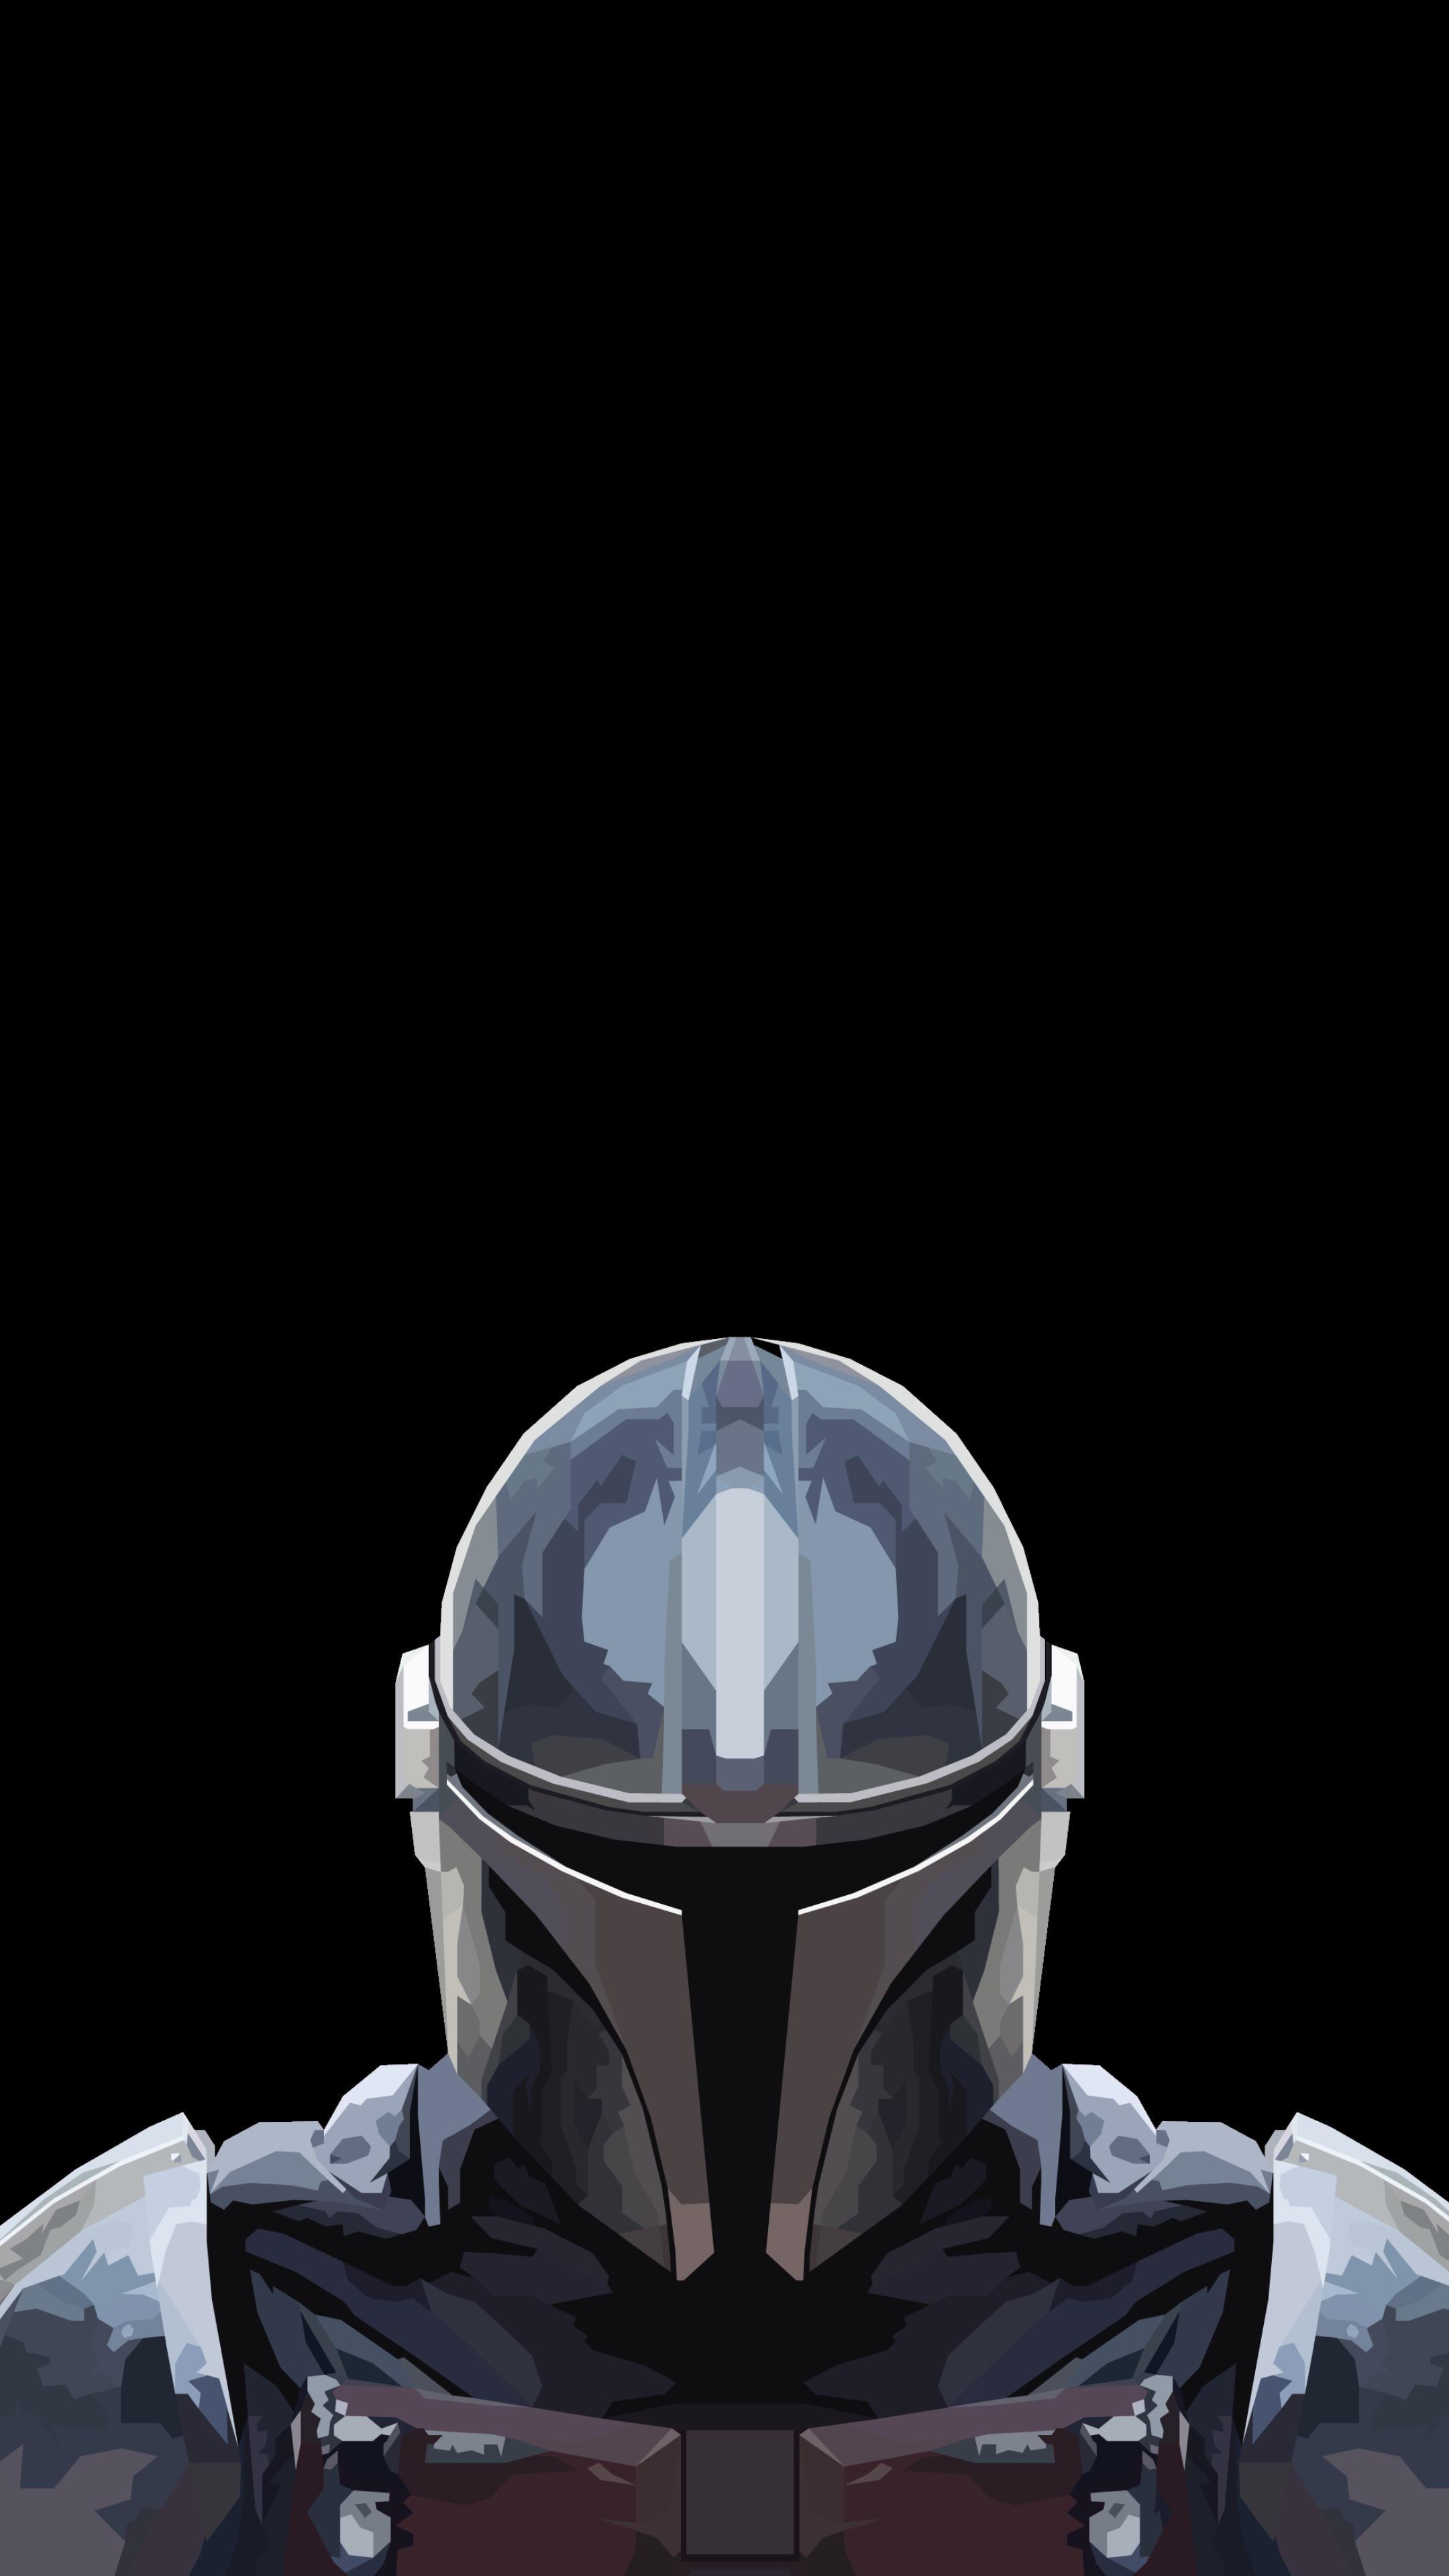 The Mandalorian wallpaper OLED iPhone idownloadblog mando bust